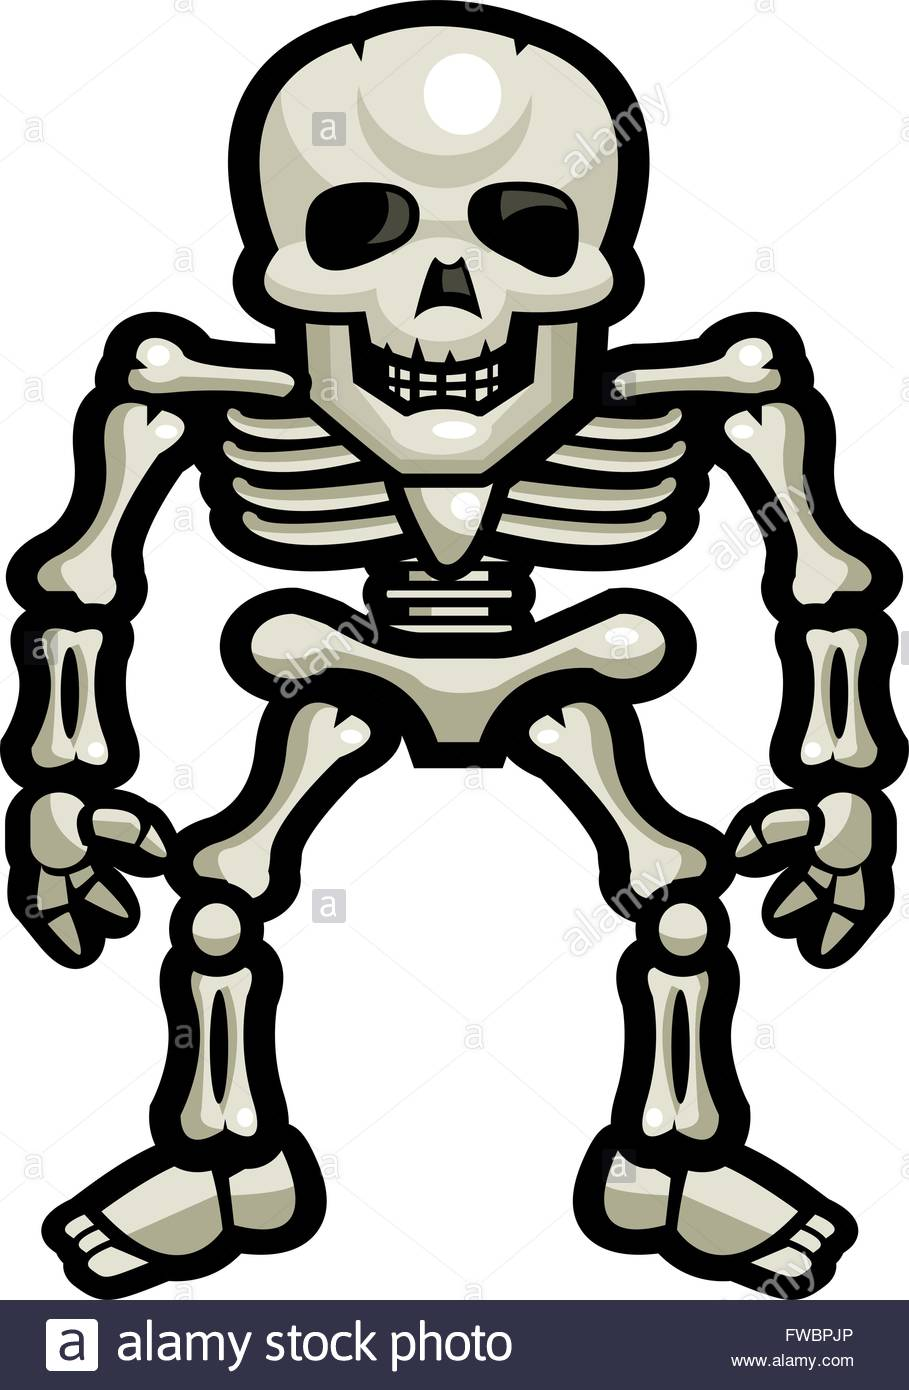 909x1390 A Cartoon Skeleton Standing Up Stock Vector Art Amp Illustration